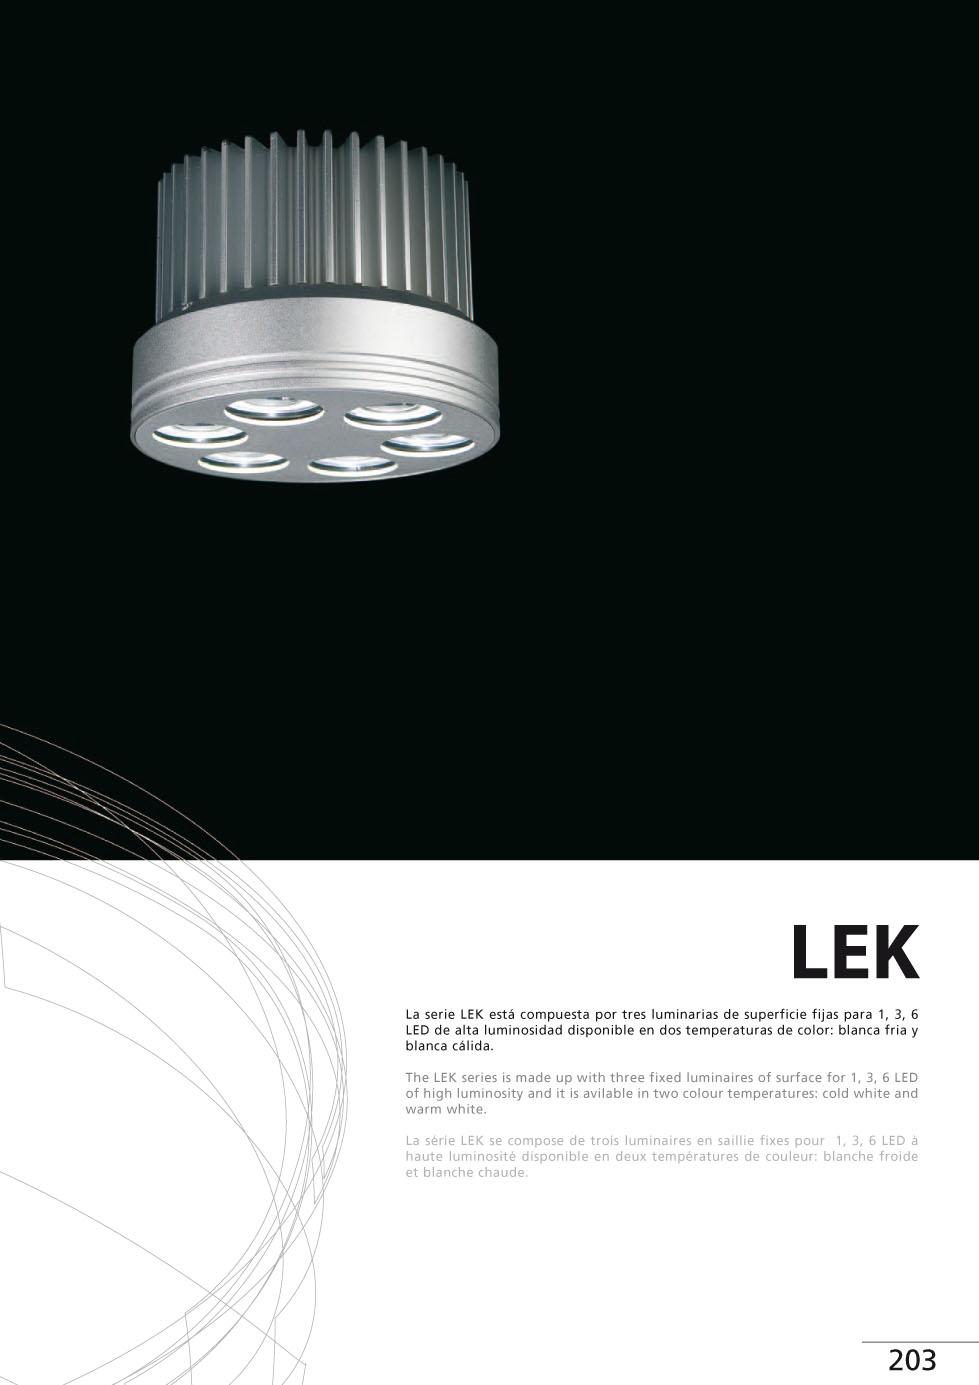 Faro lek downlight led surface fixed 1xled 3w 05010103 - Downlight led para cocina ...